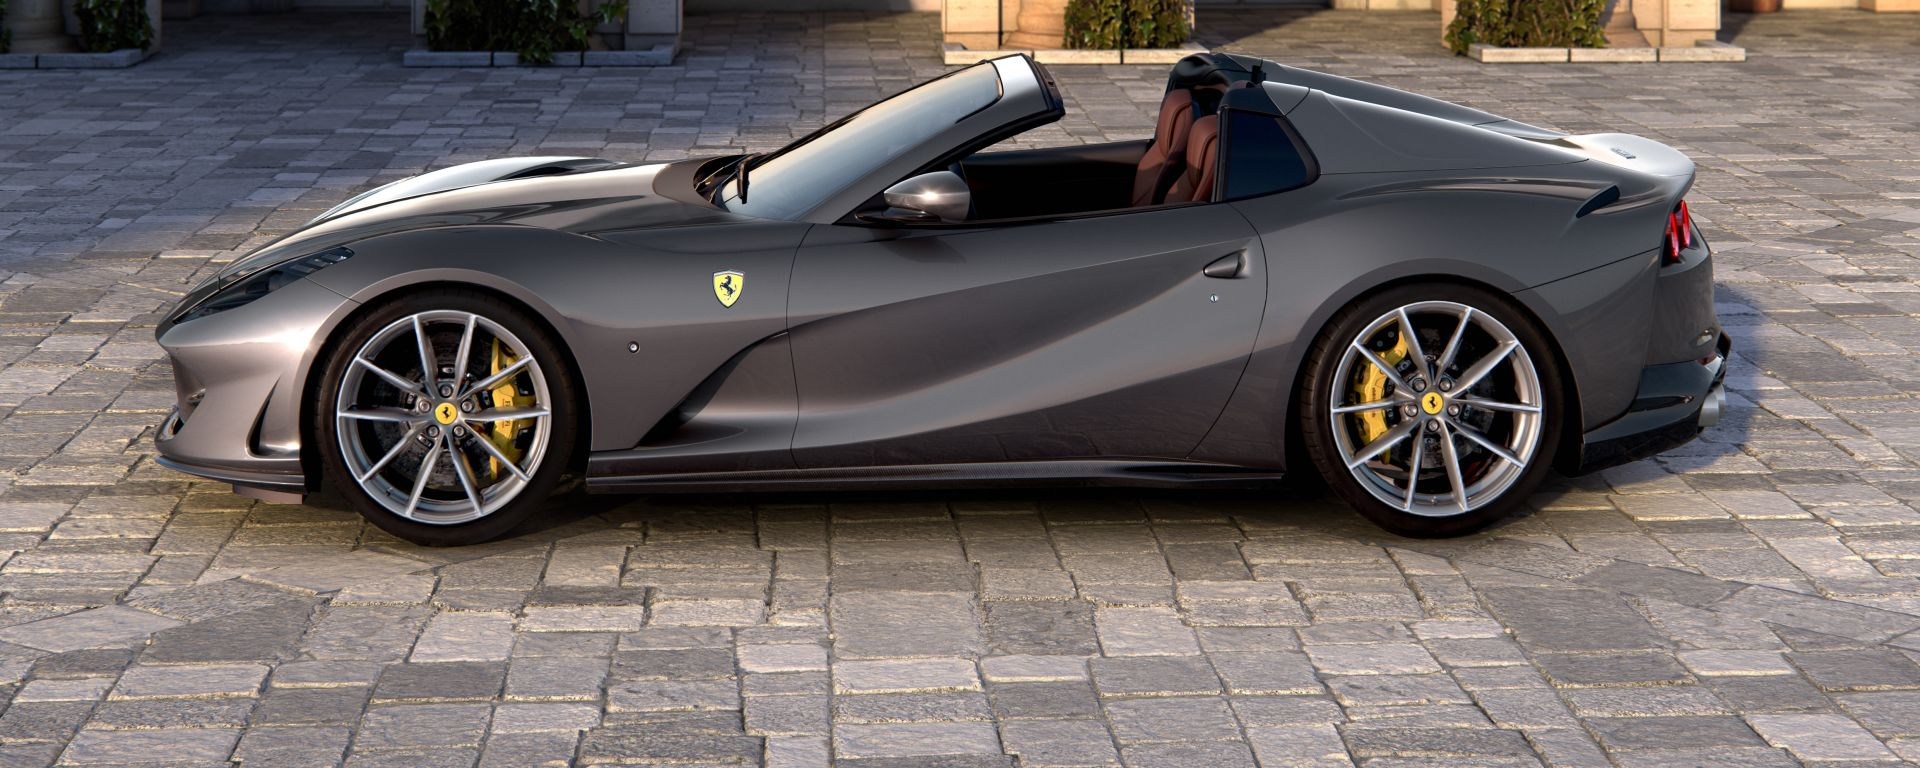 Nuova Ferrari 812 GTS, la fiancata